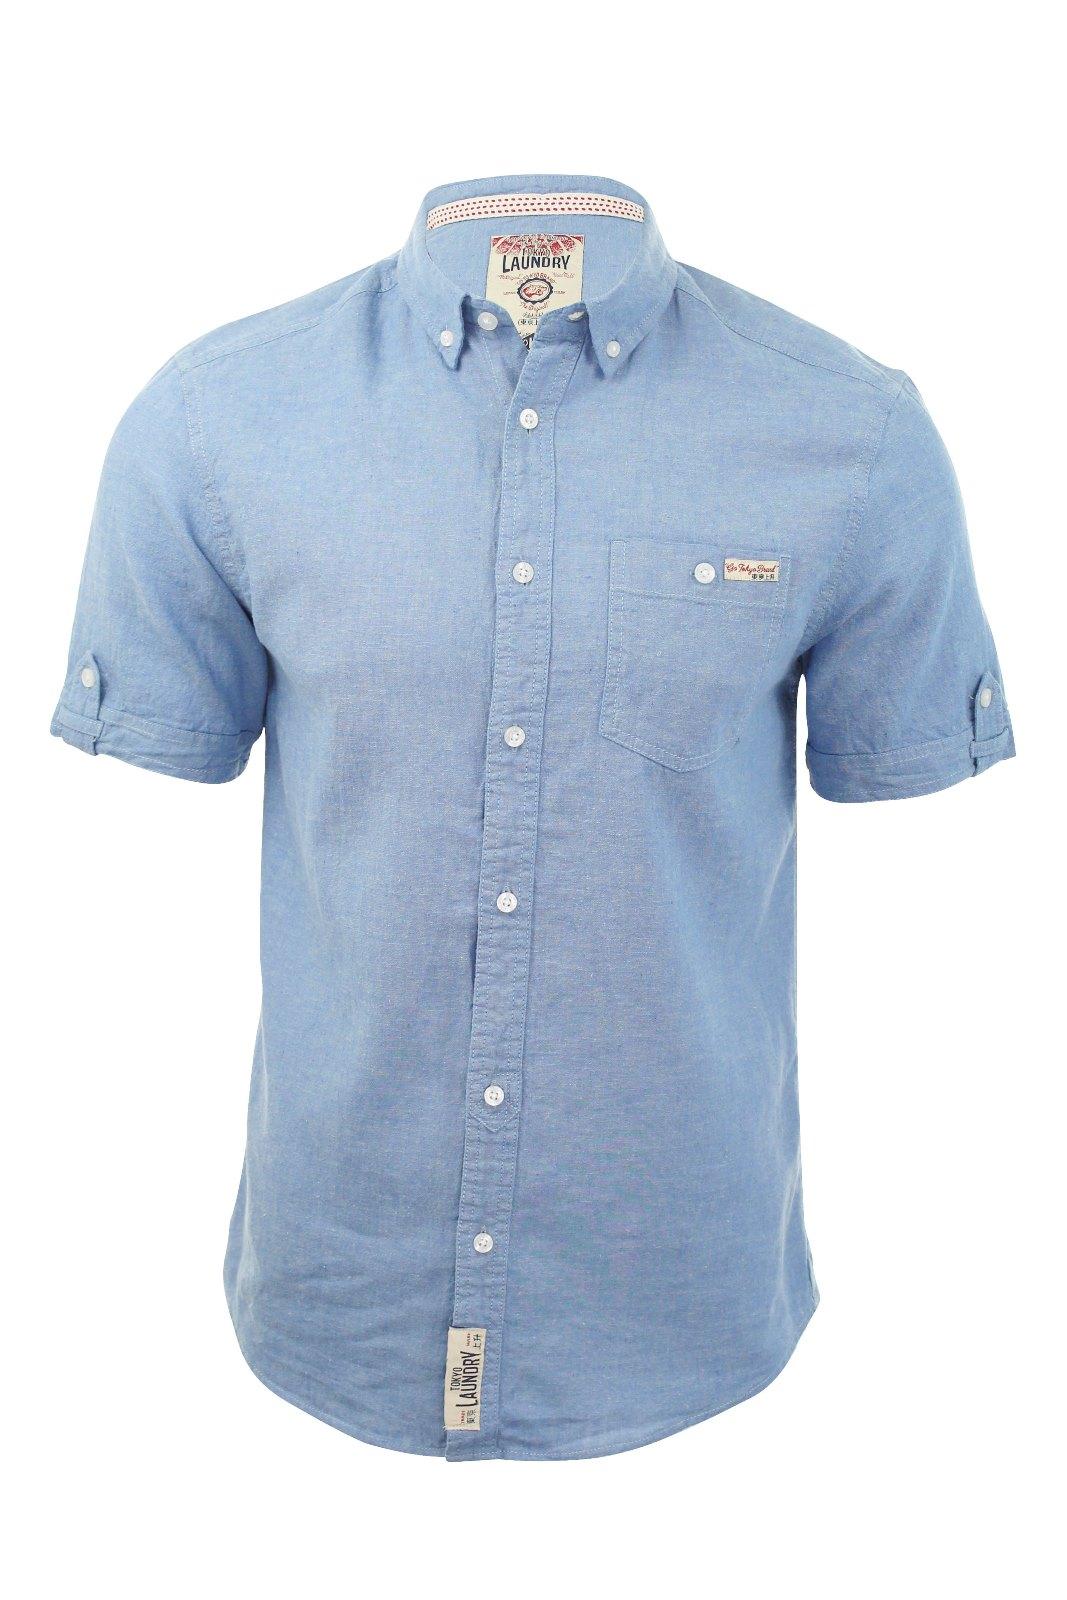 Tokyo laundry mens linen chambray shirt short sleeved ebay for Mens linen dress shirt